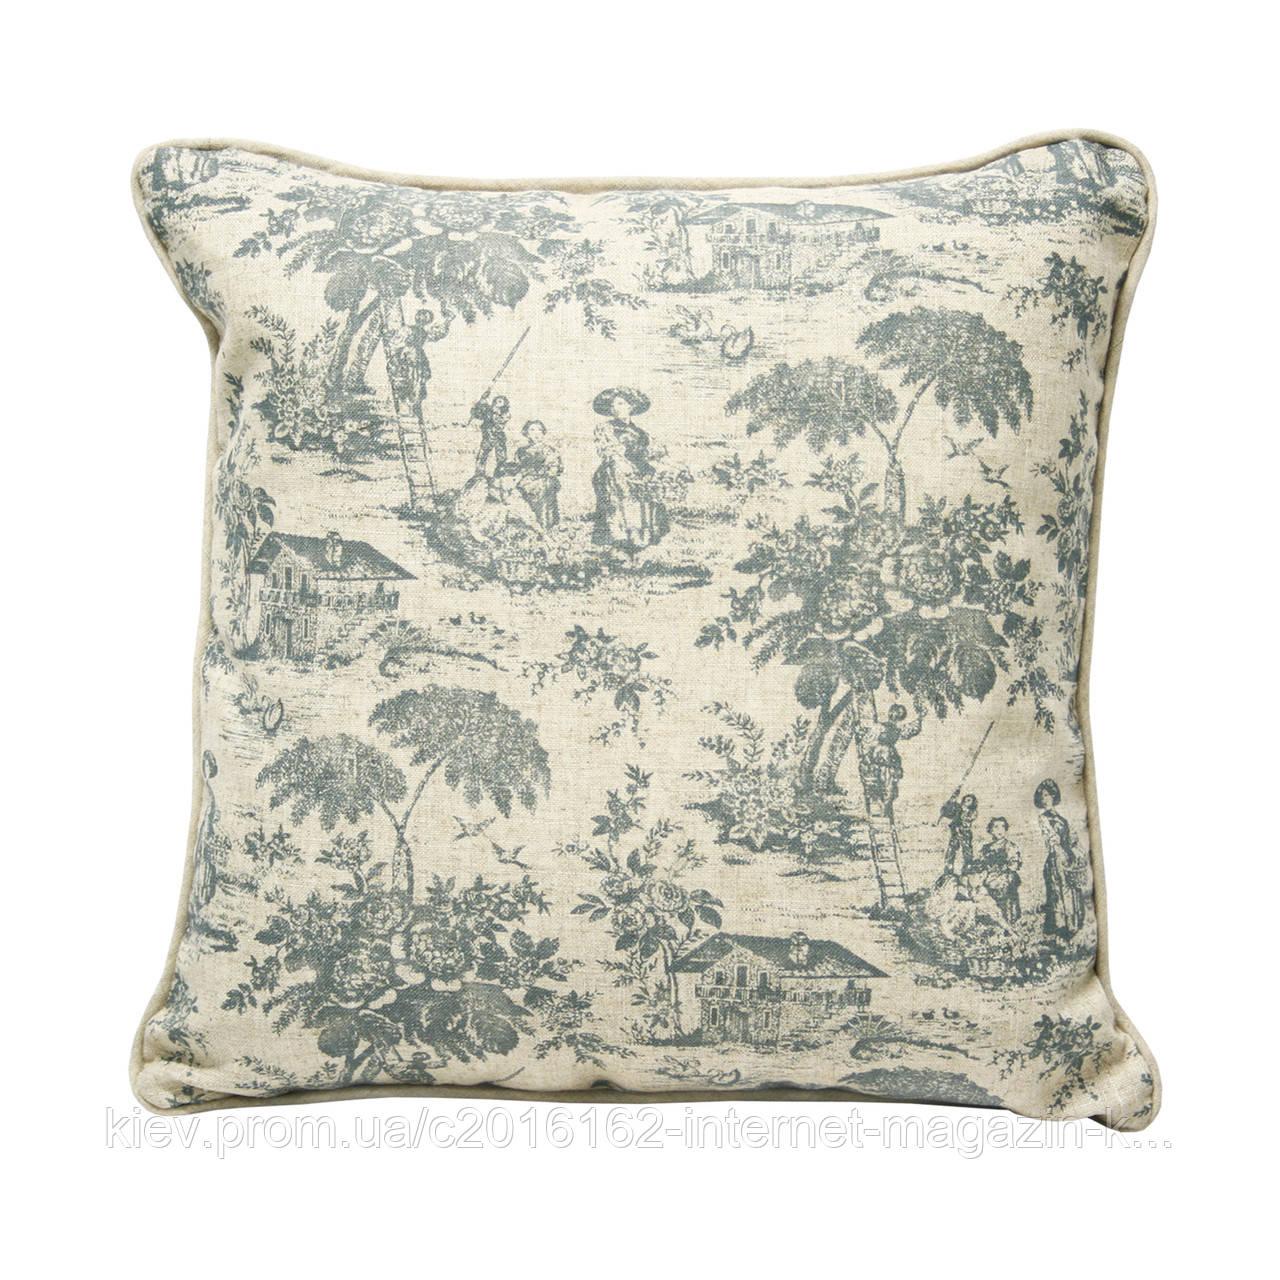 Подушка для дивана Home4You HOME  45x45cm  бежевая с этническими мотивами